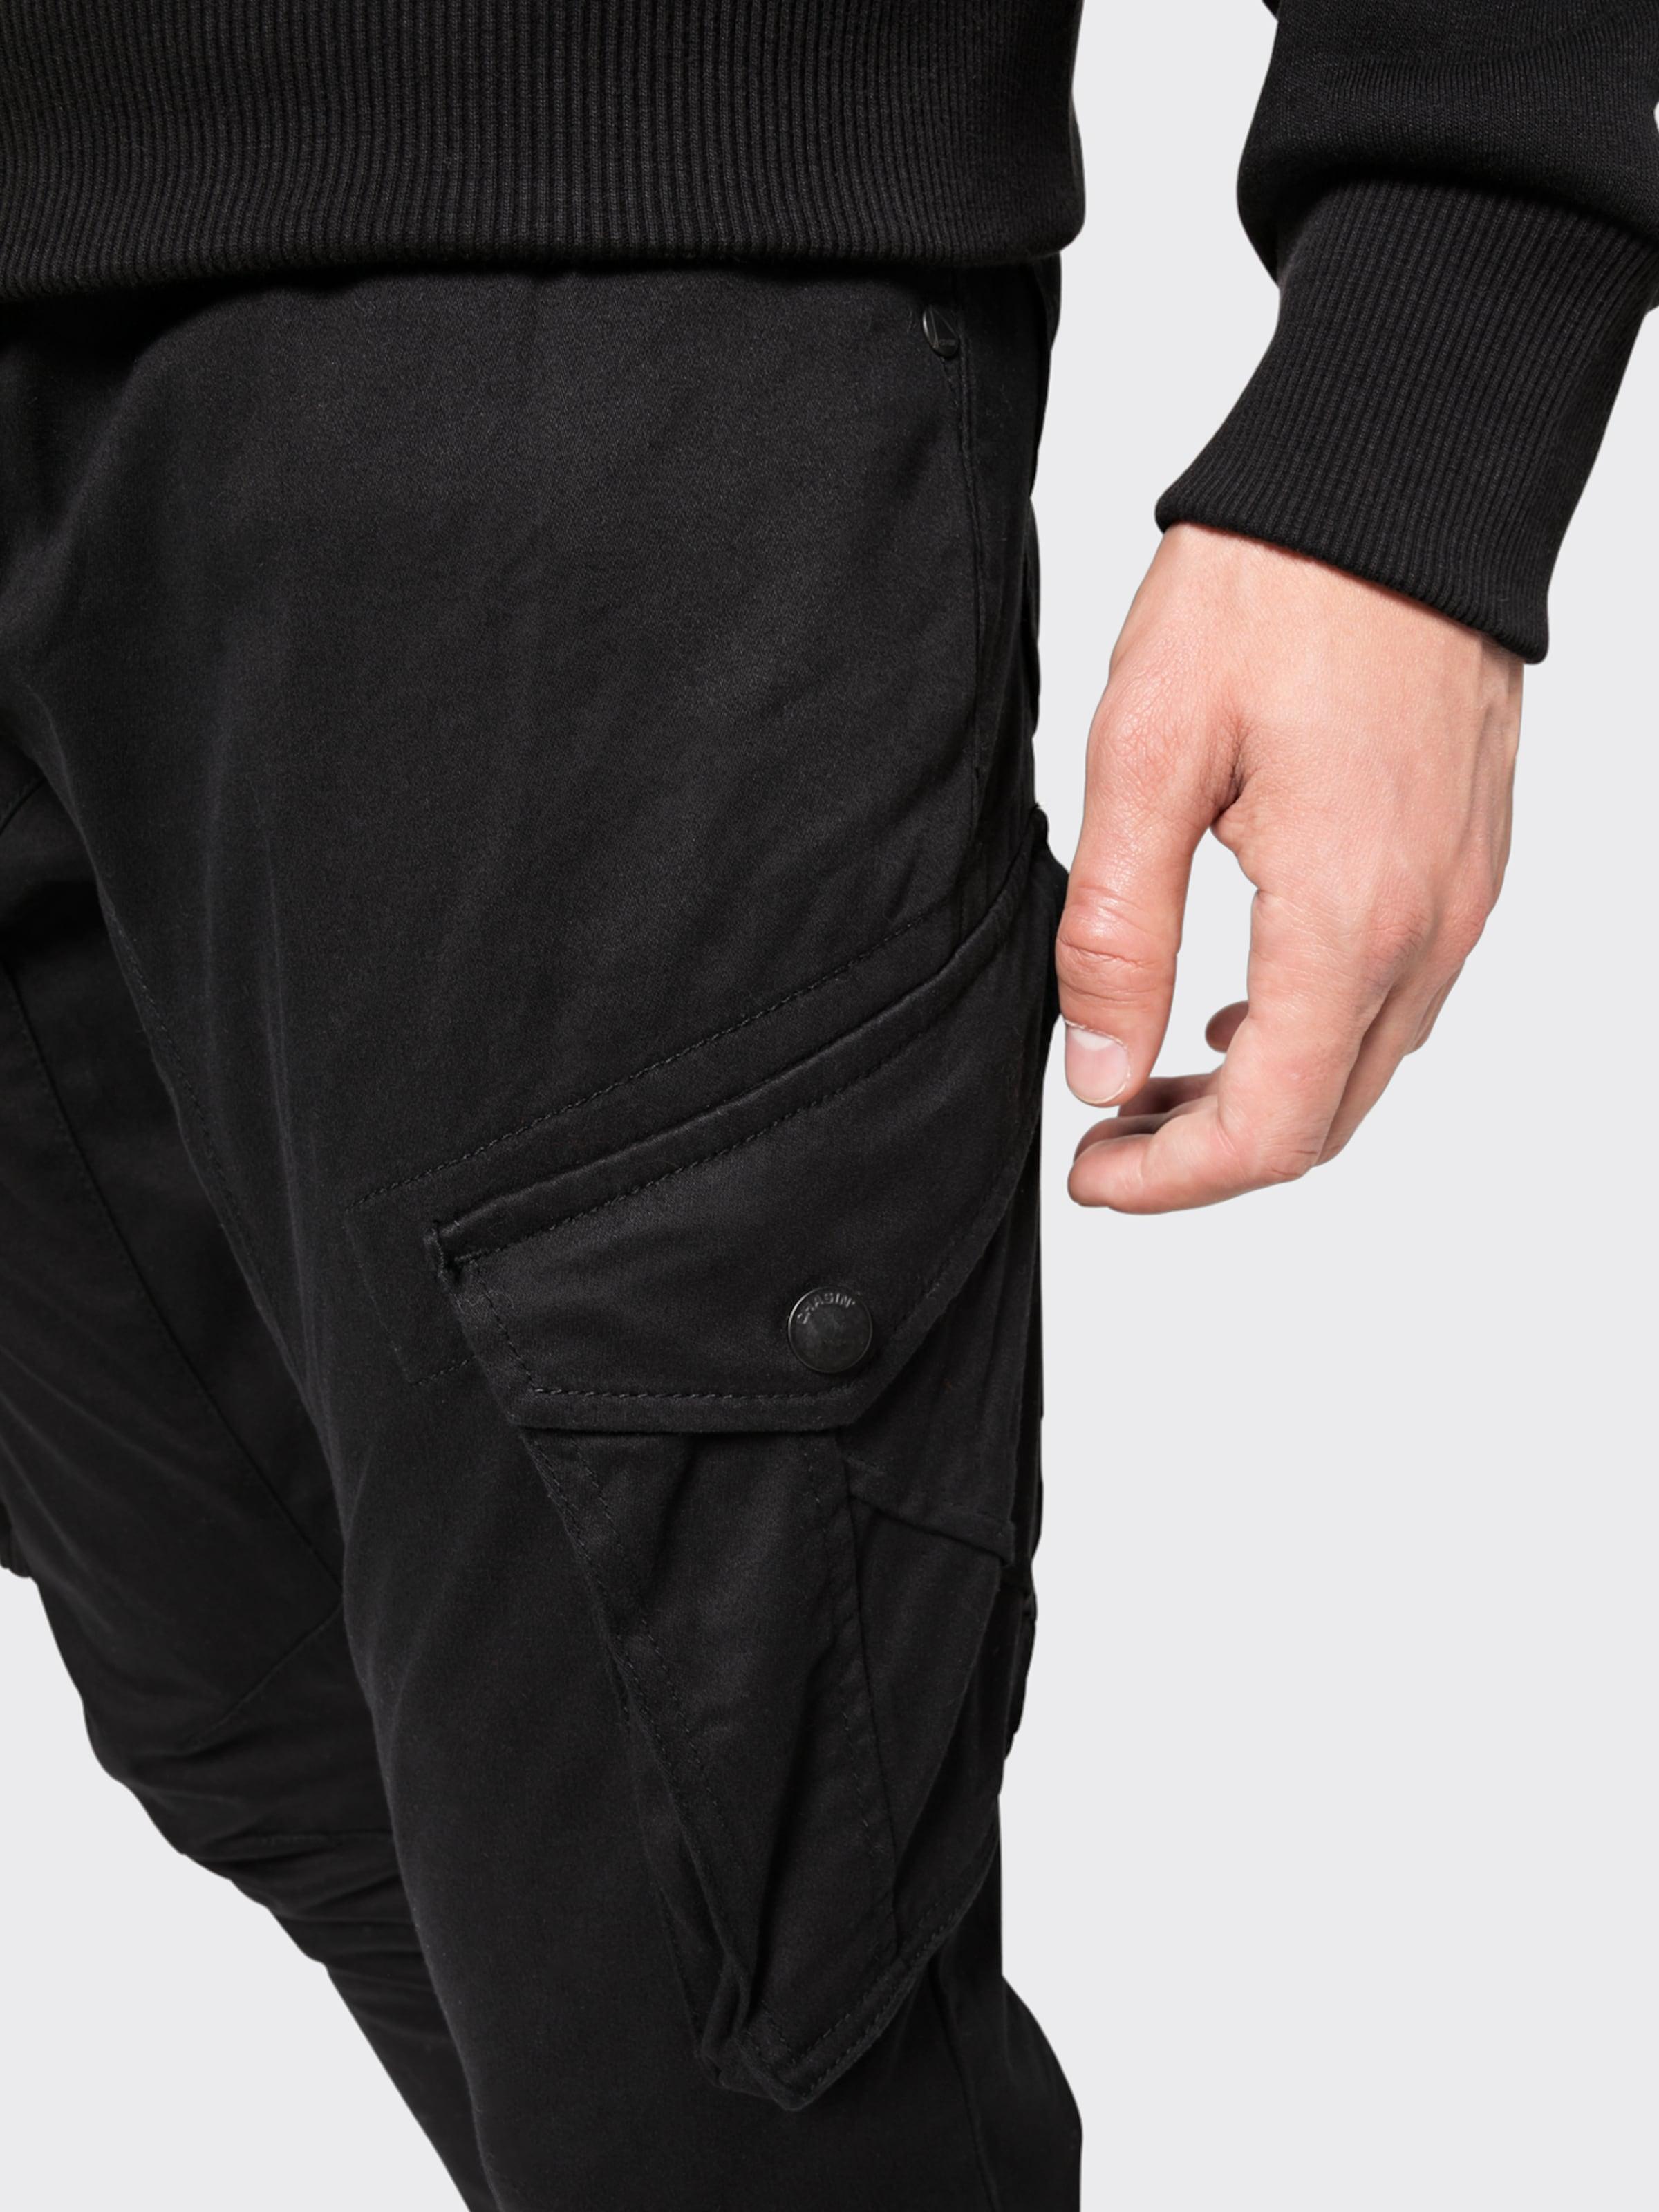 Chasin' Cargo En Ford' Pantalon Noir 'fraser l qMzGUSVp